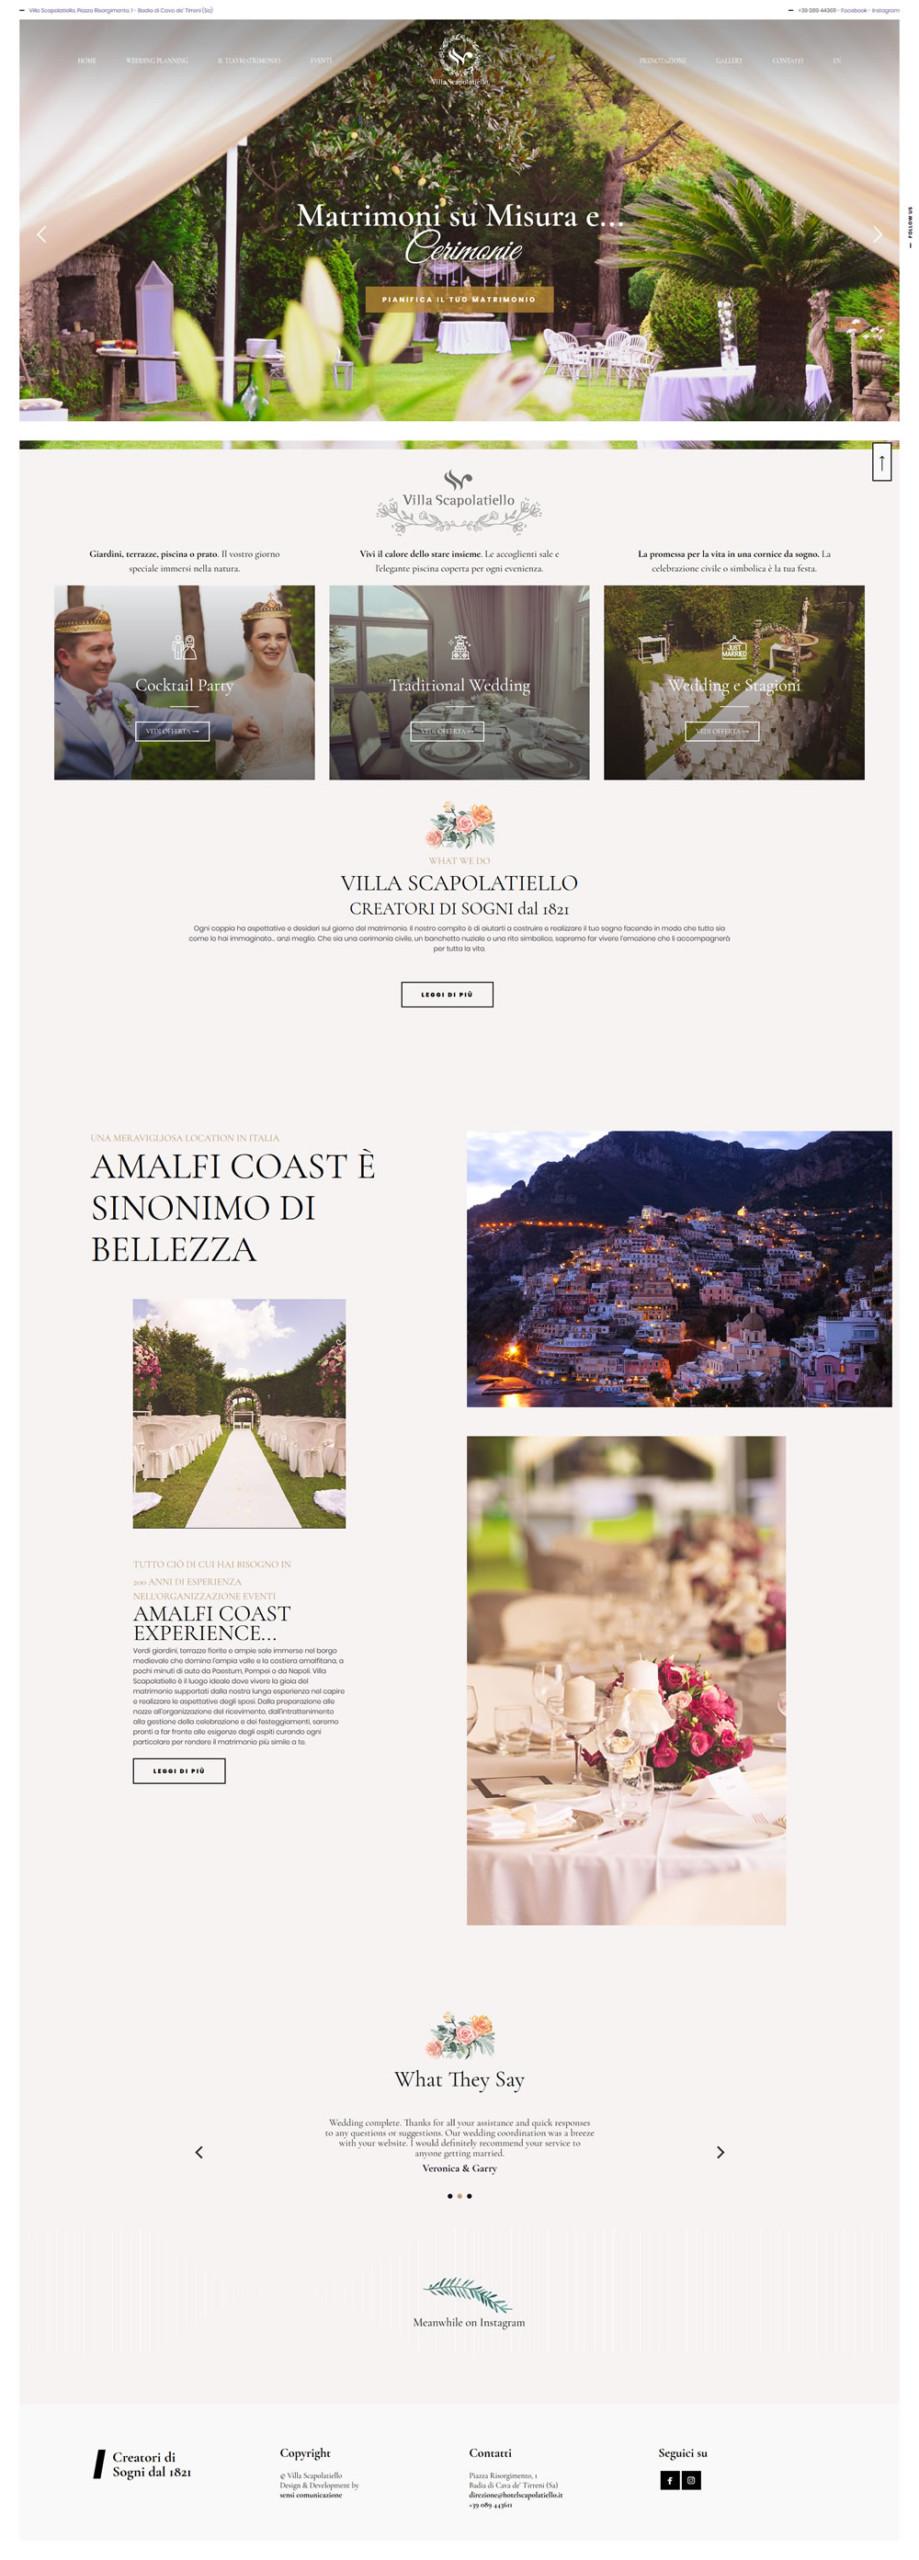 Villa Scapolatiello - Setteweb.it Portfolio Sito Web WordPress 7Web-2019